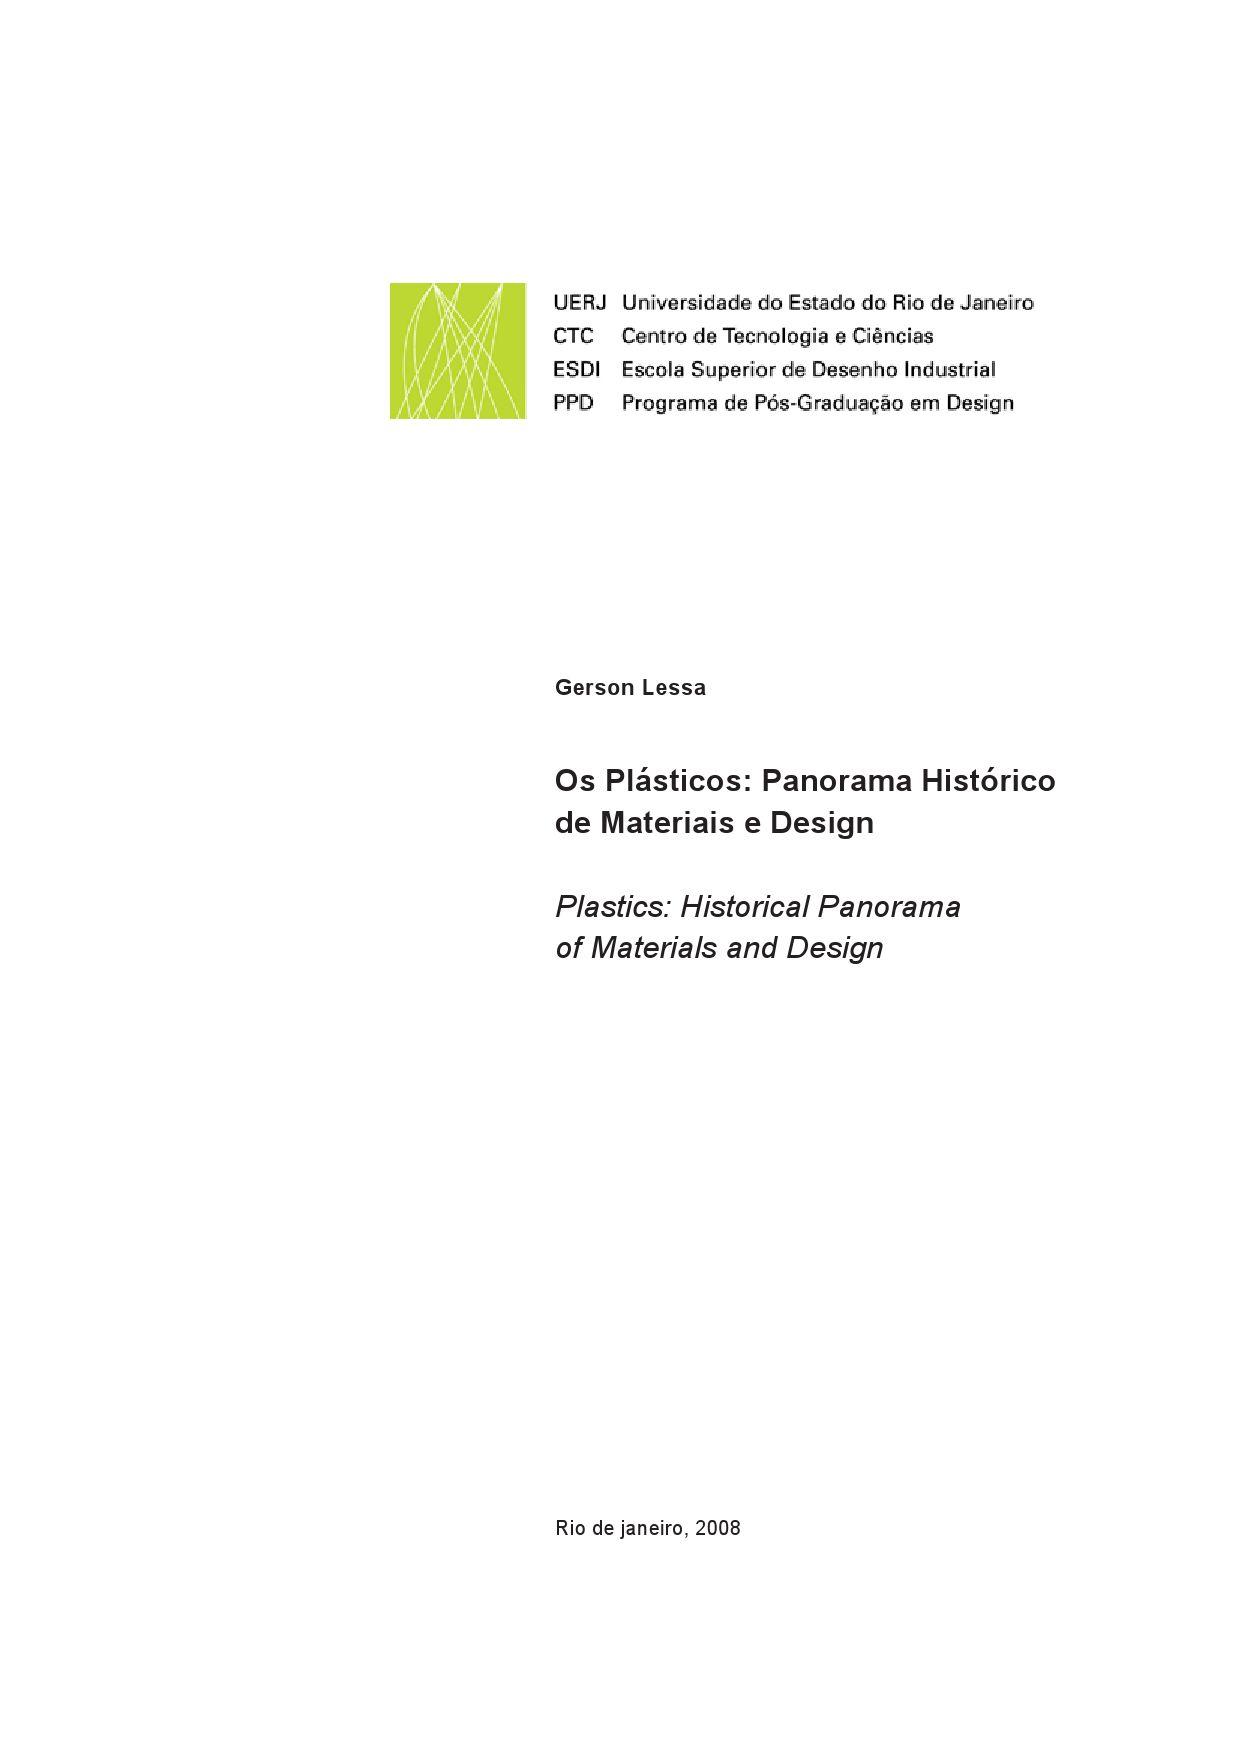 Os plsticos panorama histrico de materiais e design by gerson os plsticos panorama histrico de materiais e design by gerson lessa issuu fandeluxe Image collections